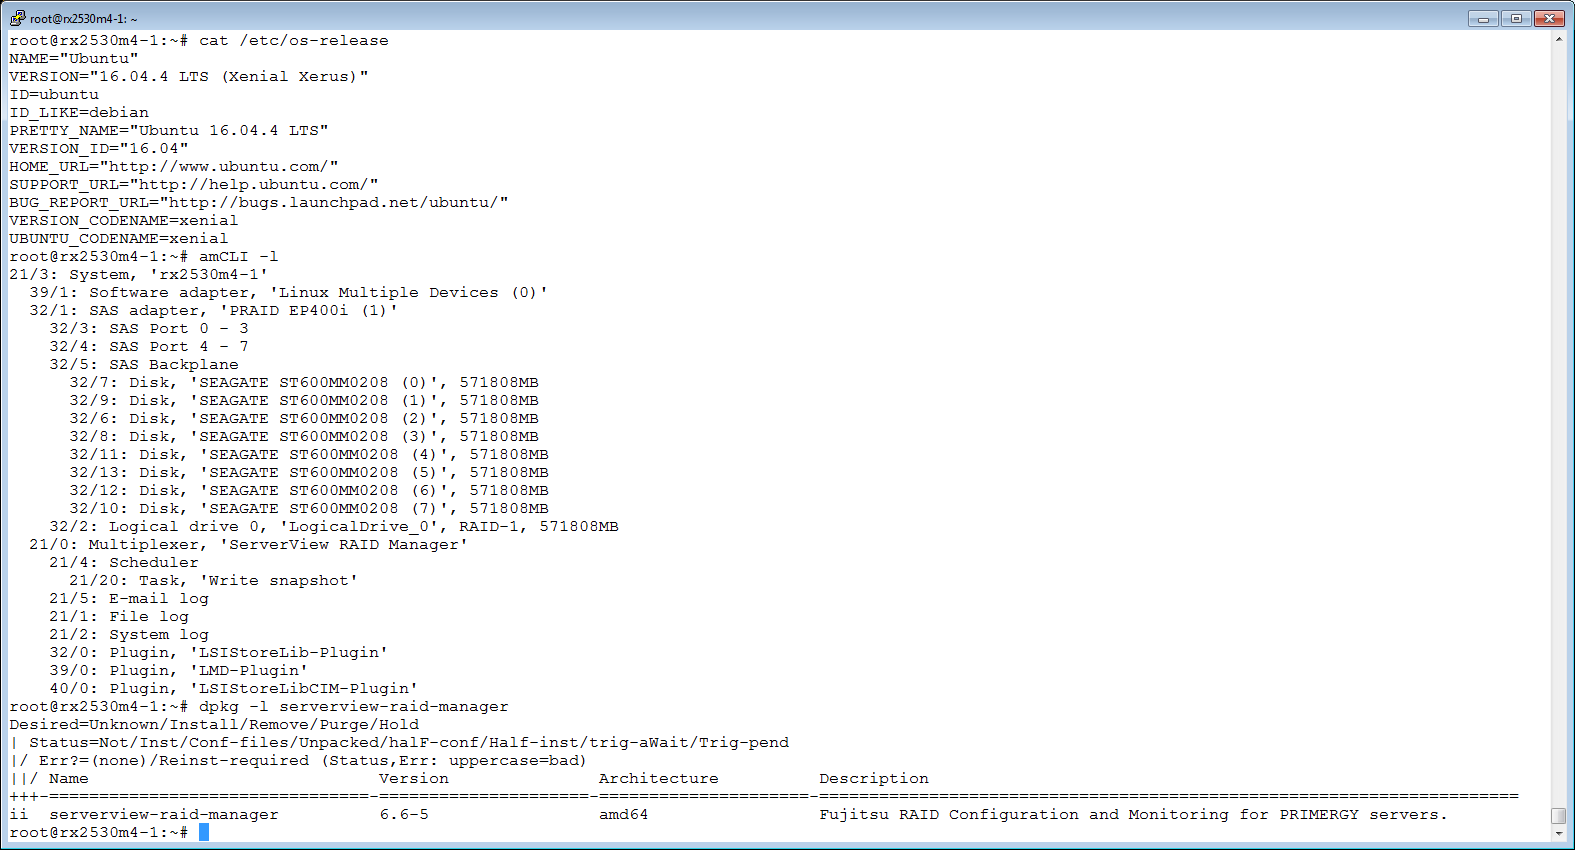 Masa's blog: Fujitsu ServerView RAID Manager 6 6 5 for Ubuntu